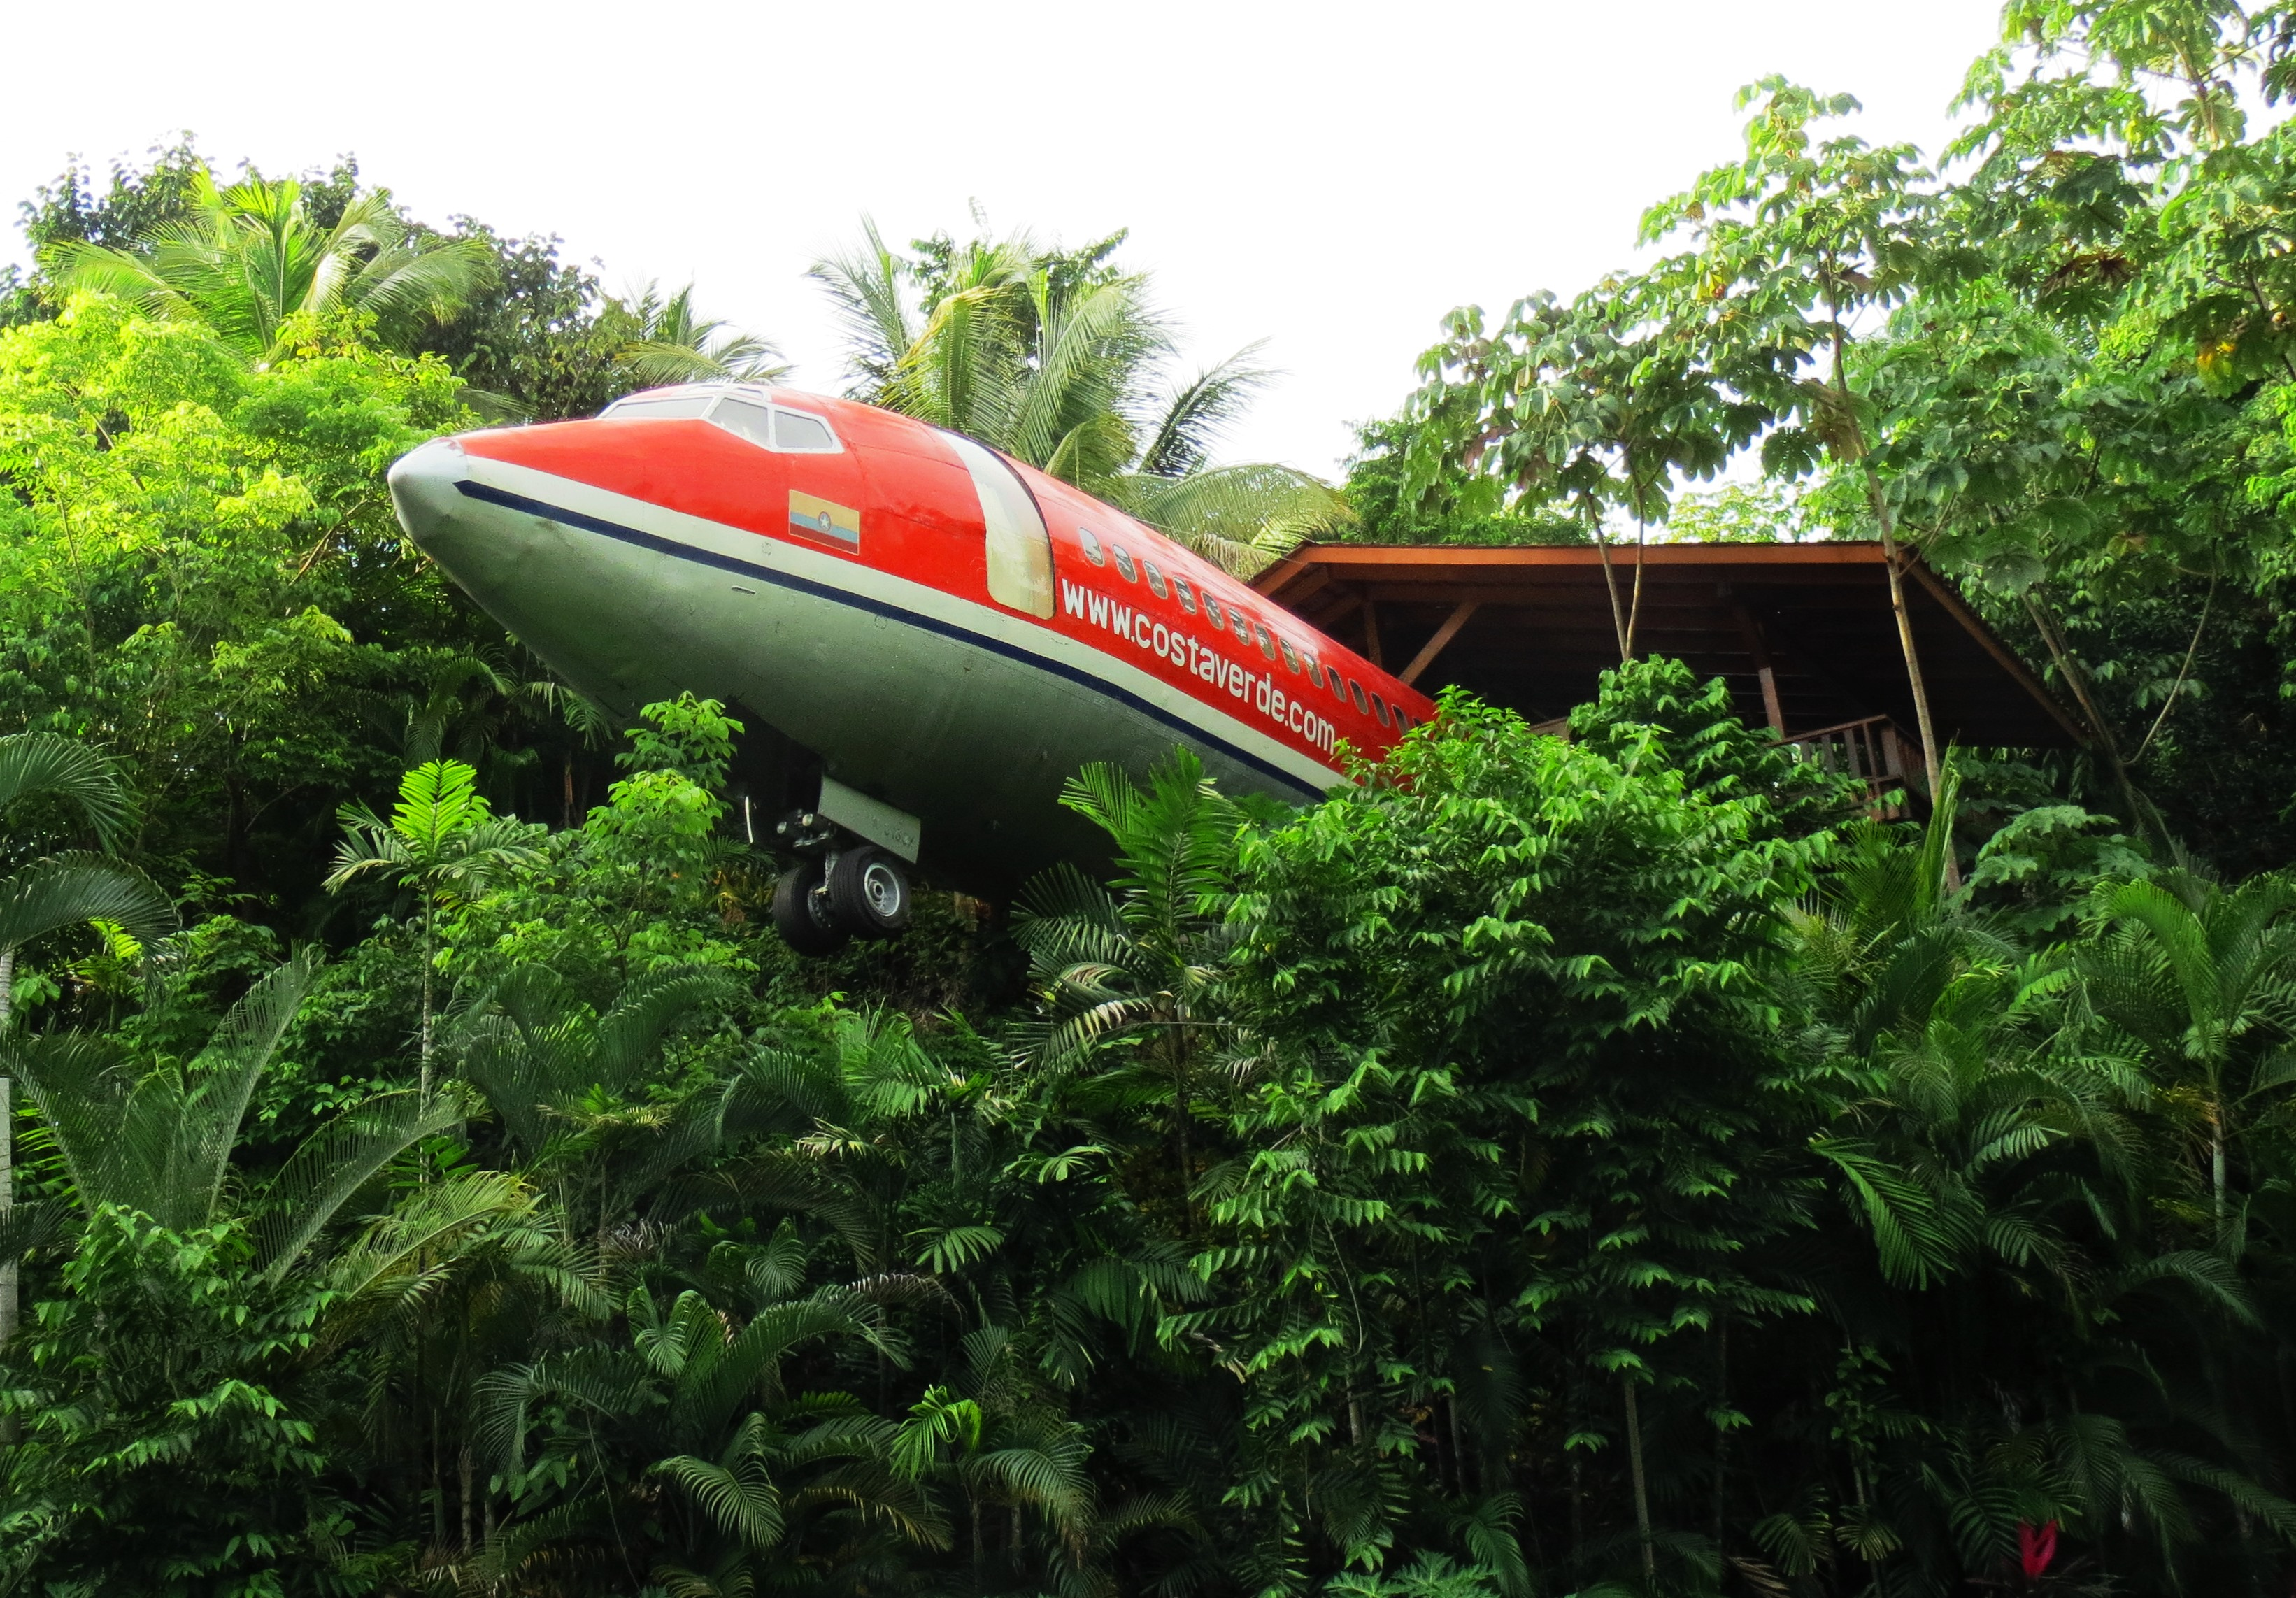 Costa Verde Plane Hotel